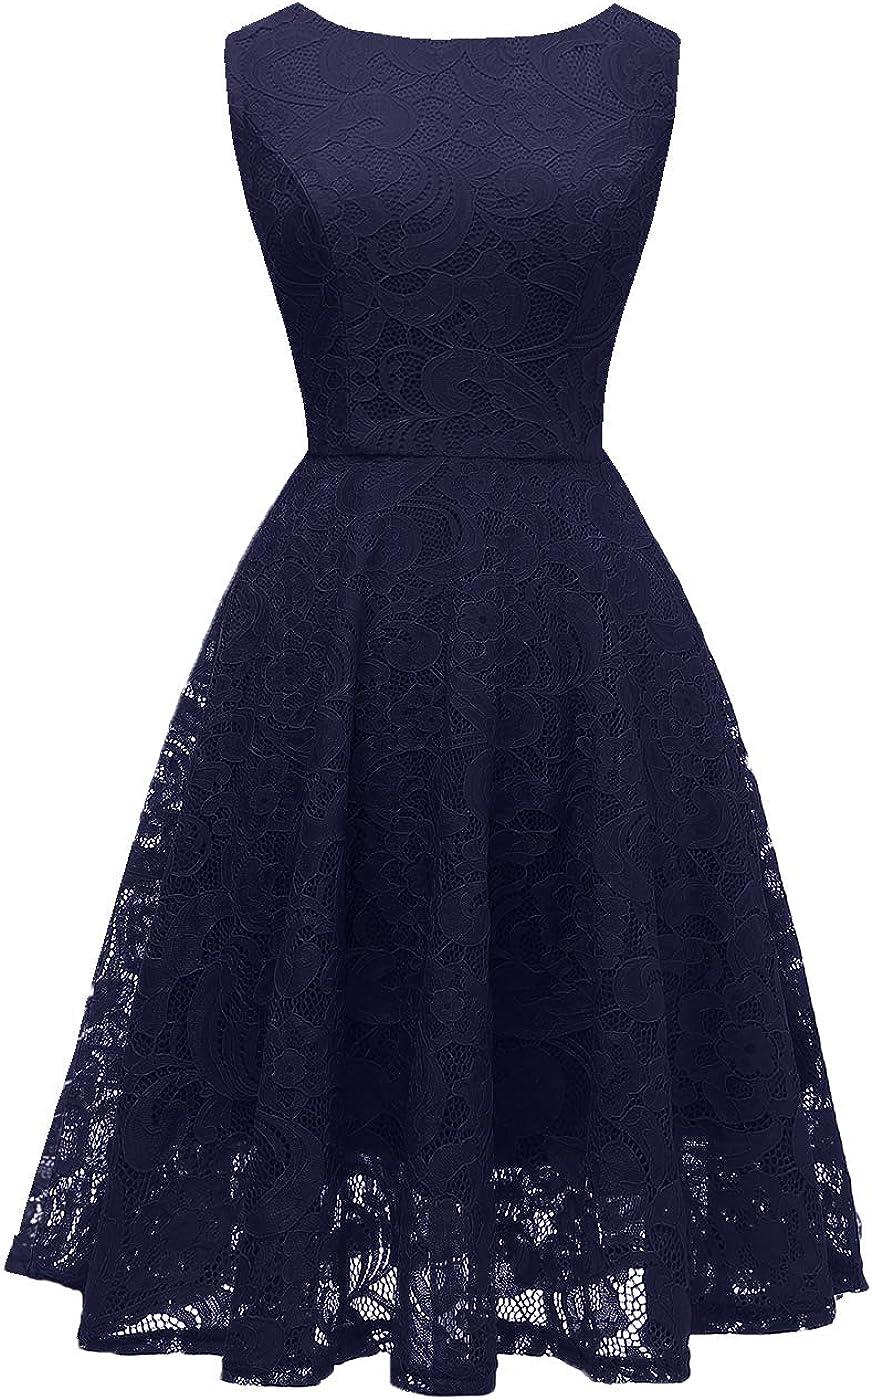 OBBUE Women's Boatneck Lace Cocktail Party Dress Floral Short Prom Dress